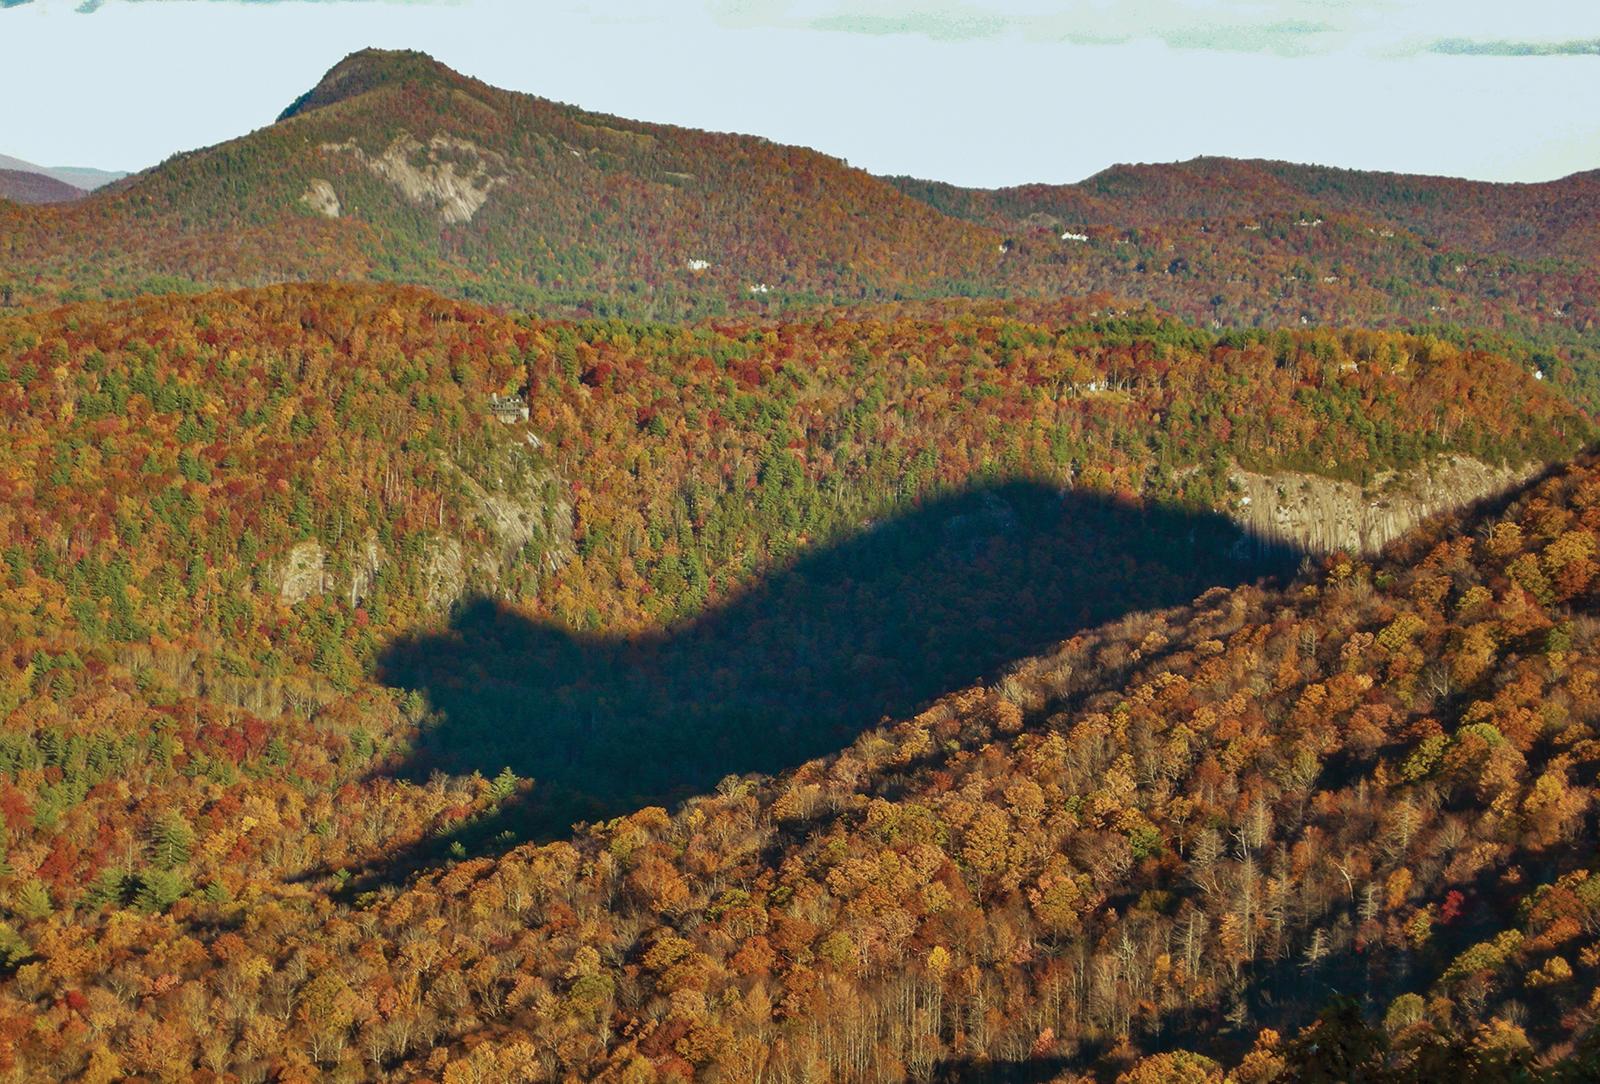 highlands cashiers land trust Big View bear shadow